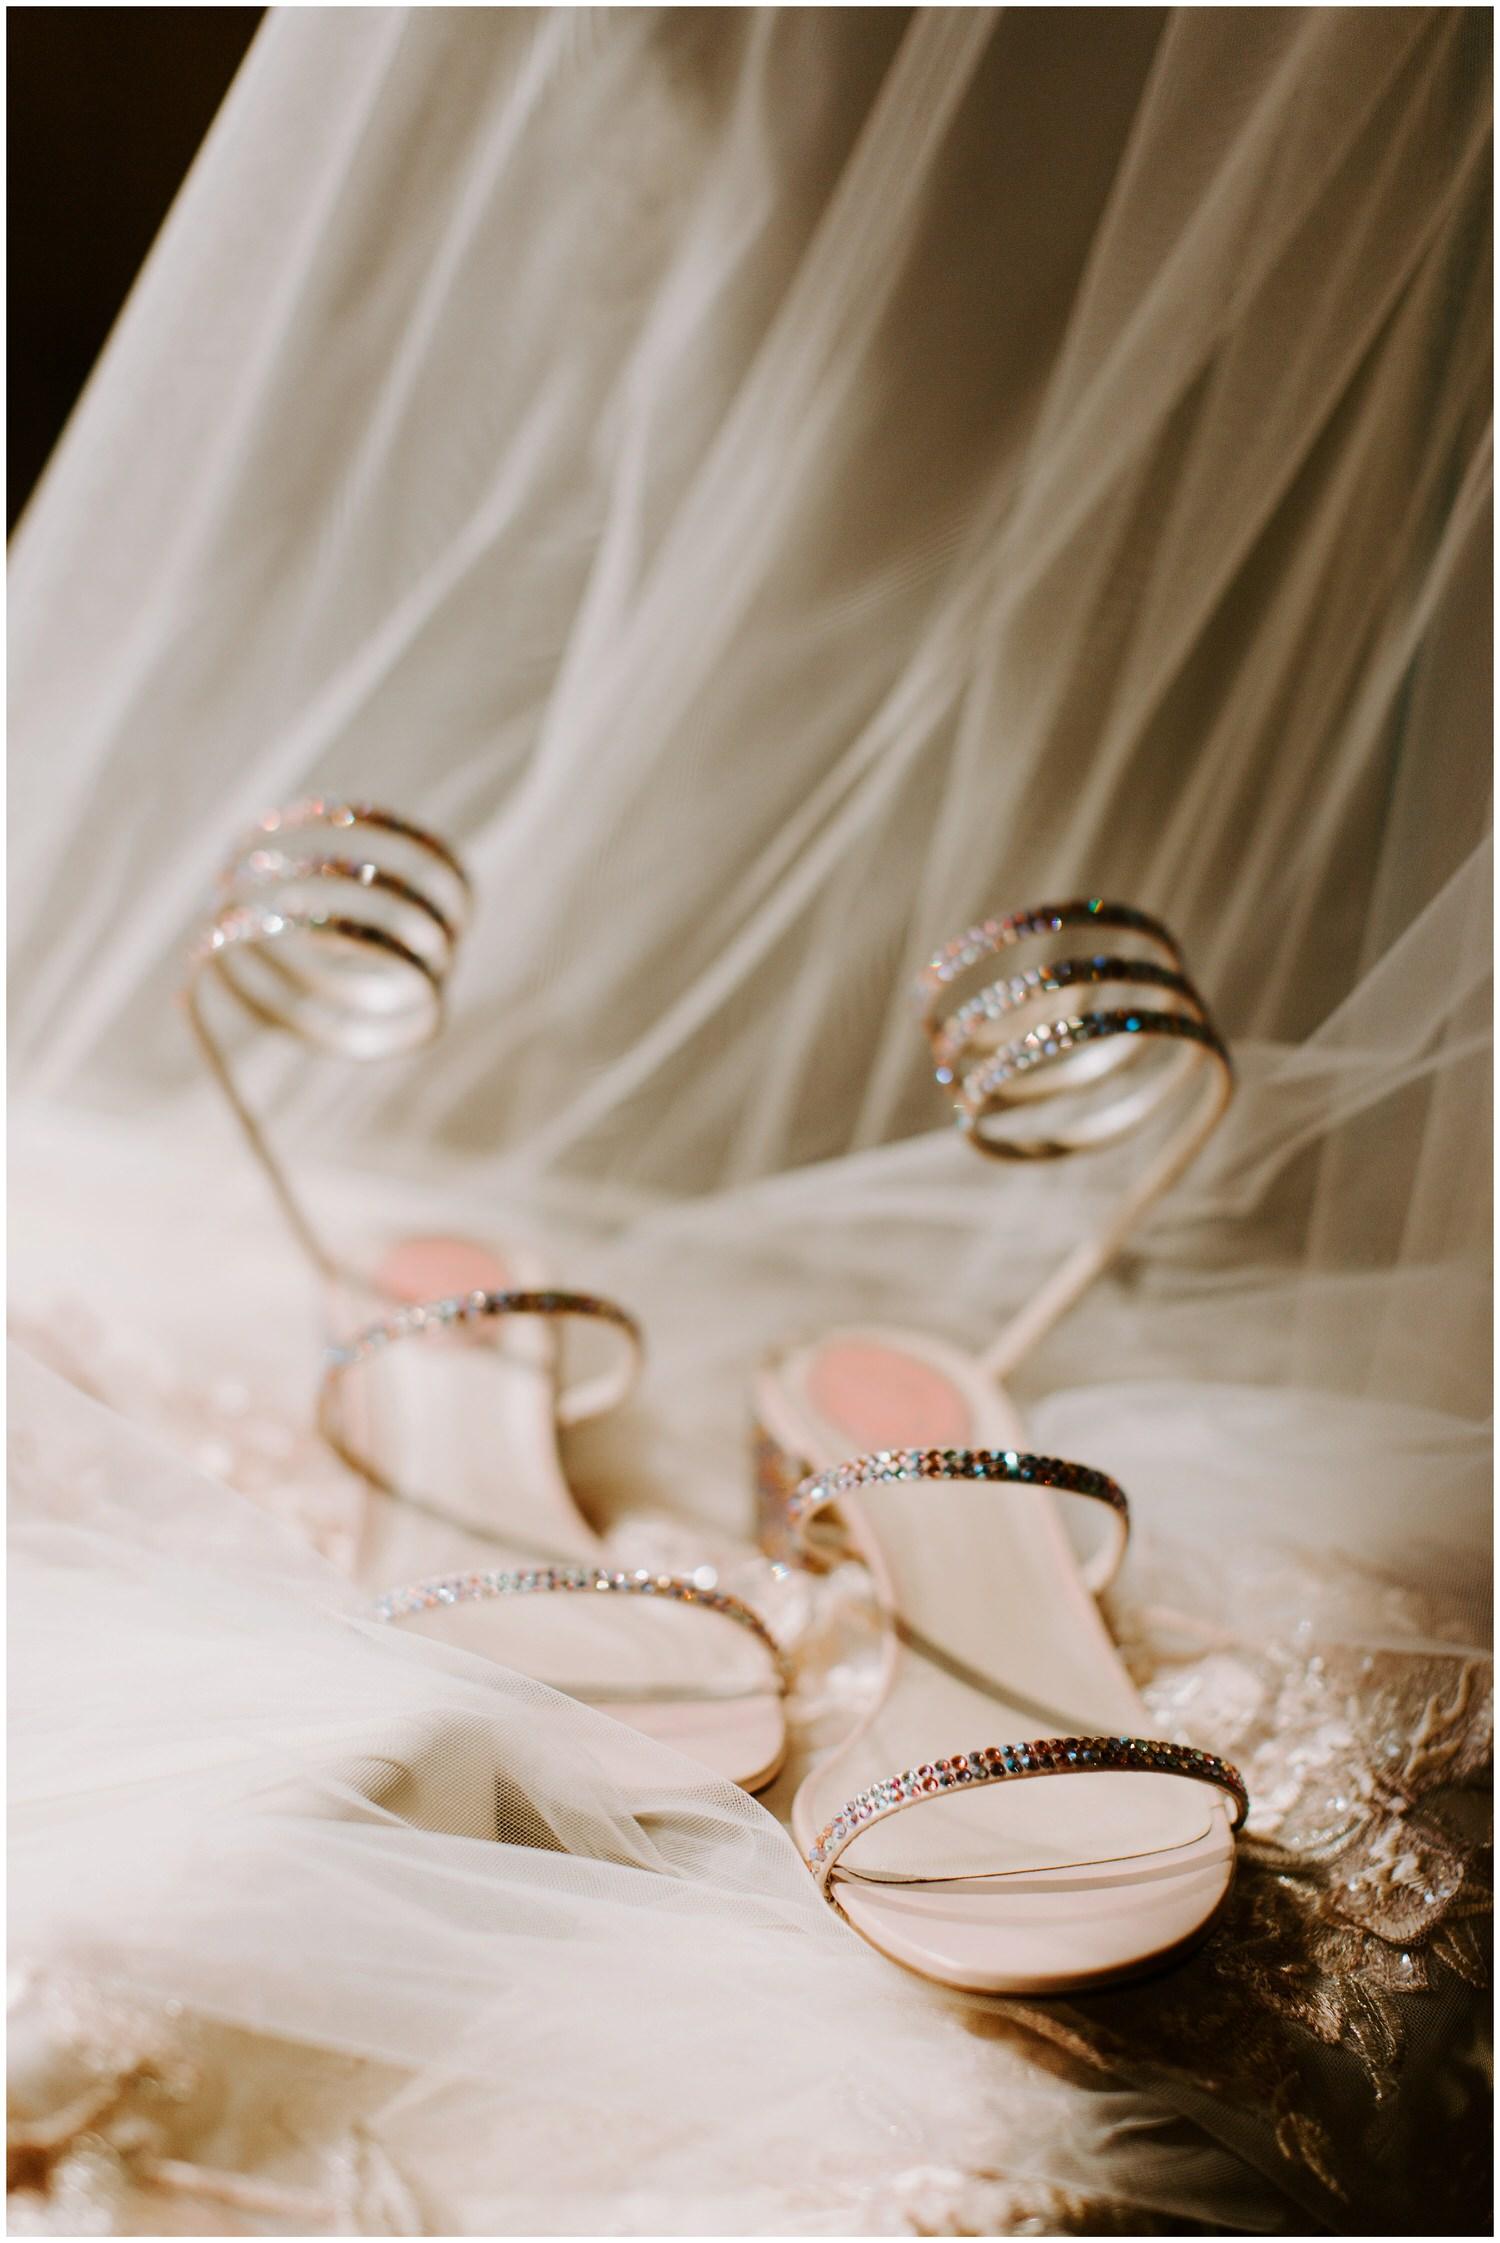 rene caovilla snake wrap satin sandal wedding shoes